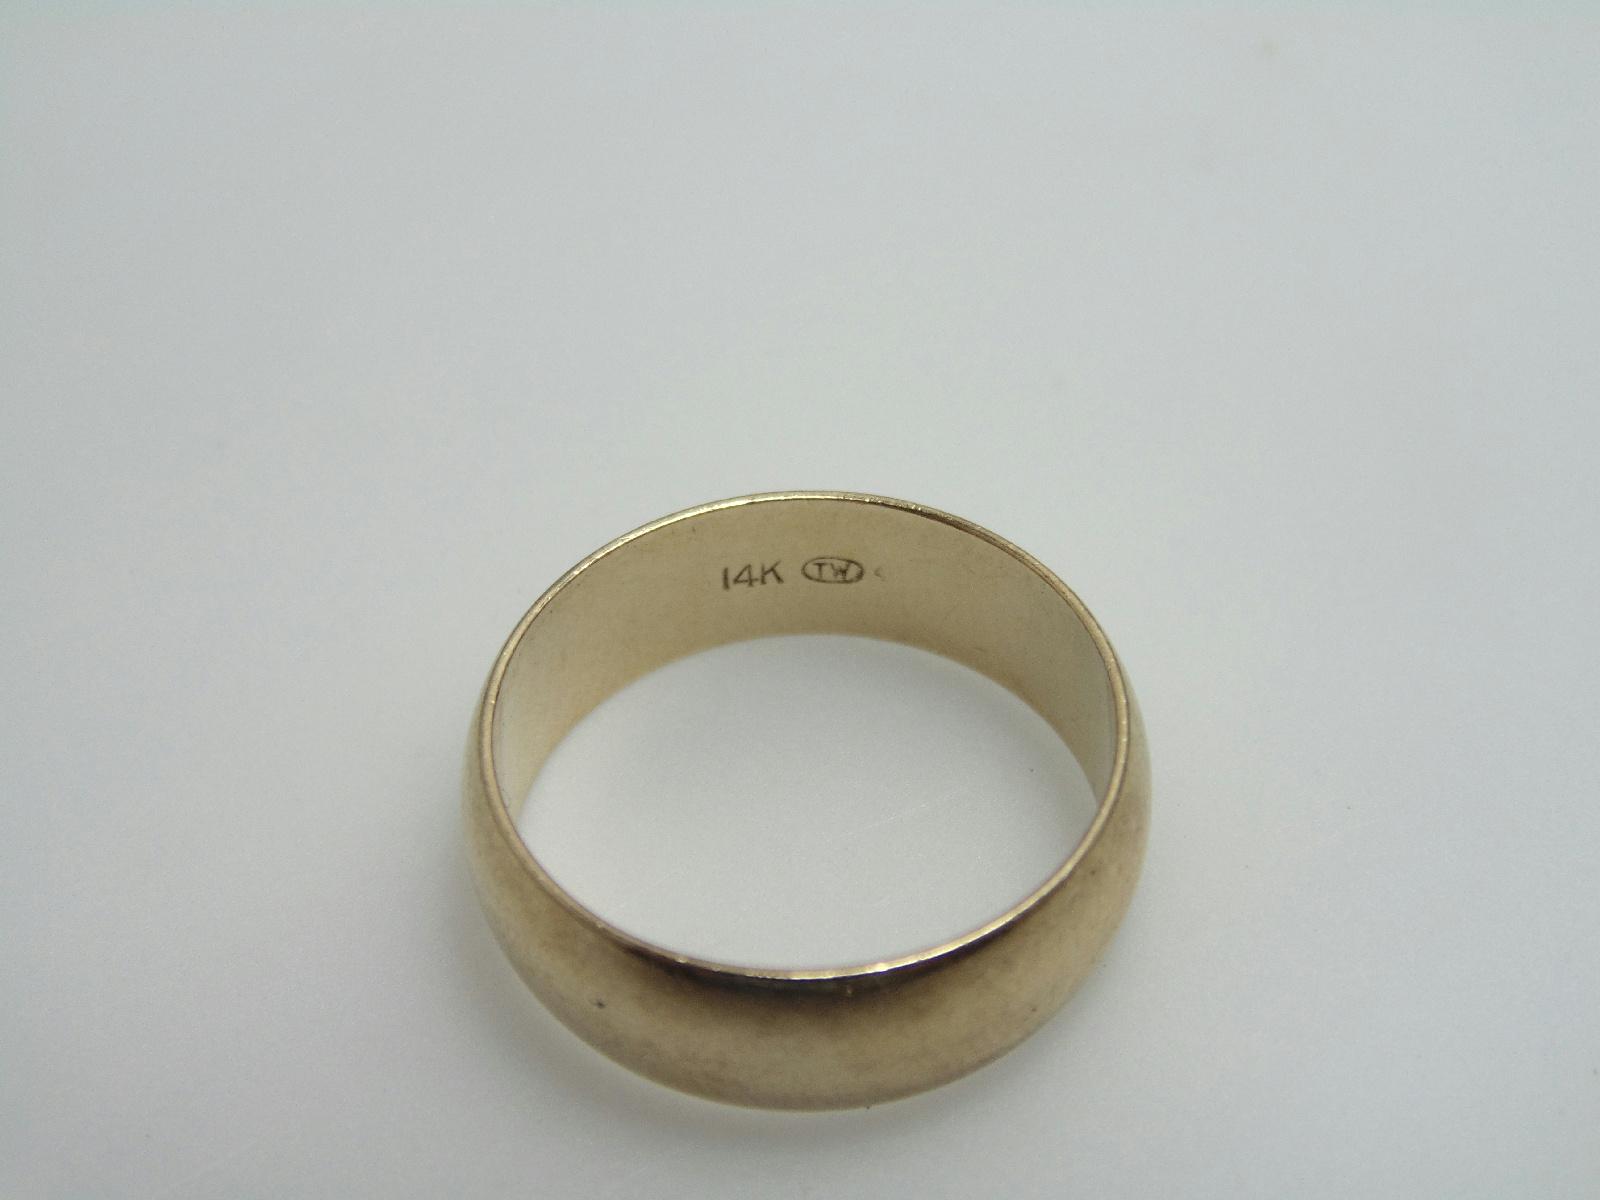 14k yellow gold jewelry thick wedding band plain ring sz 6 5